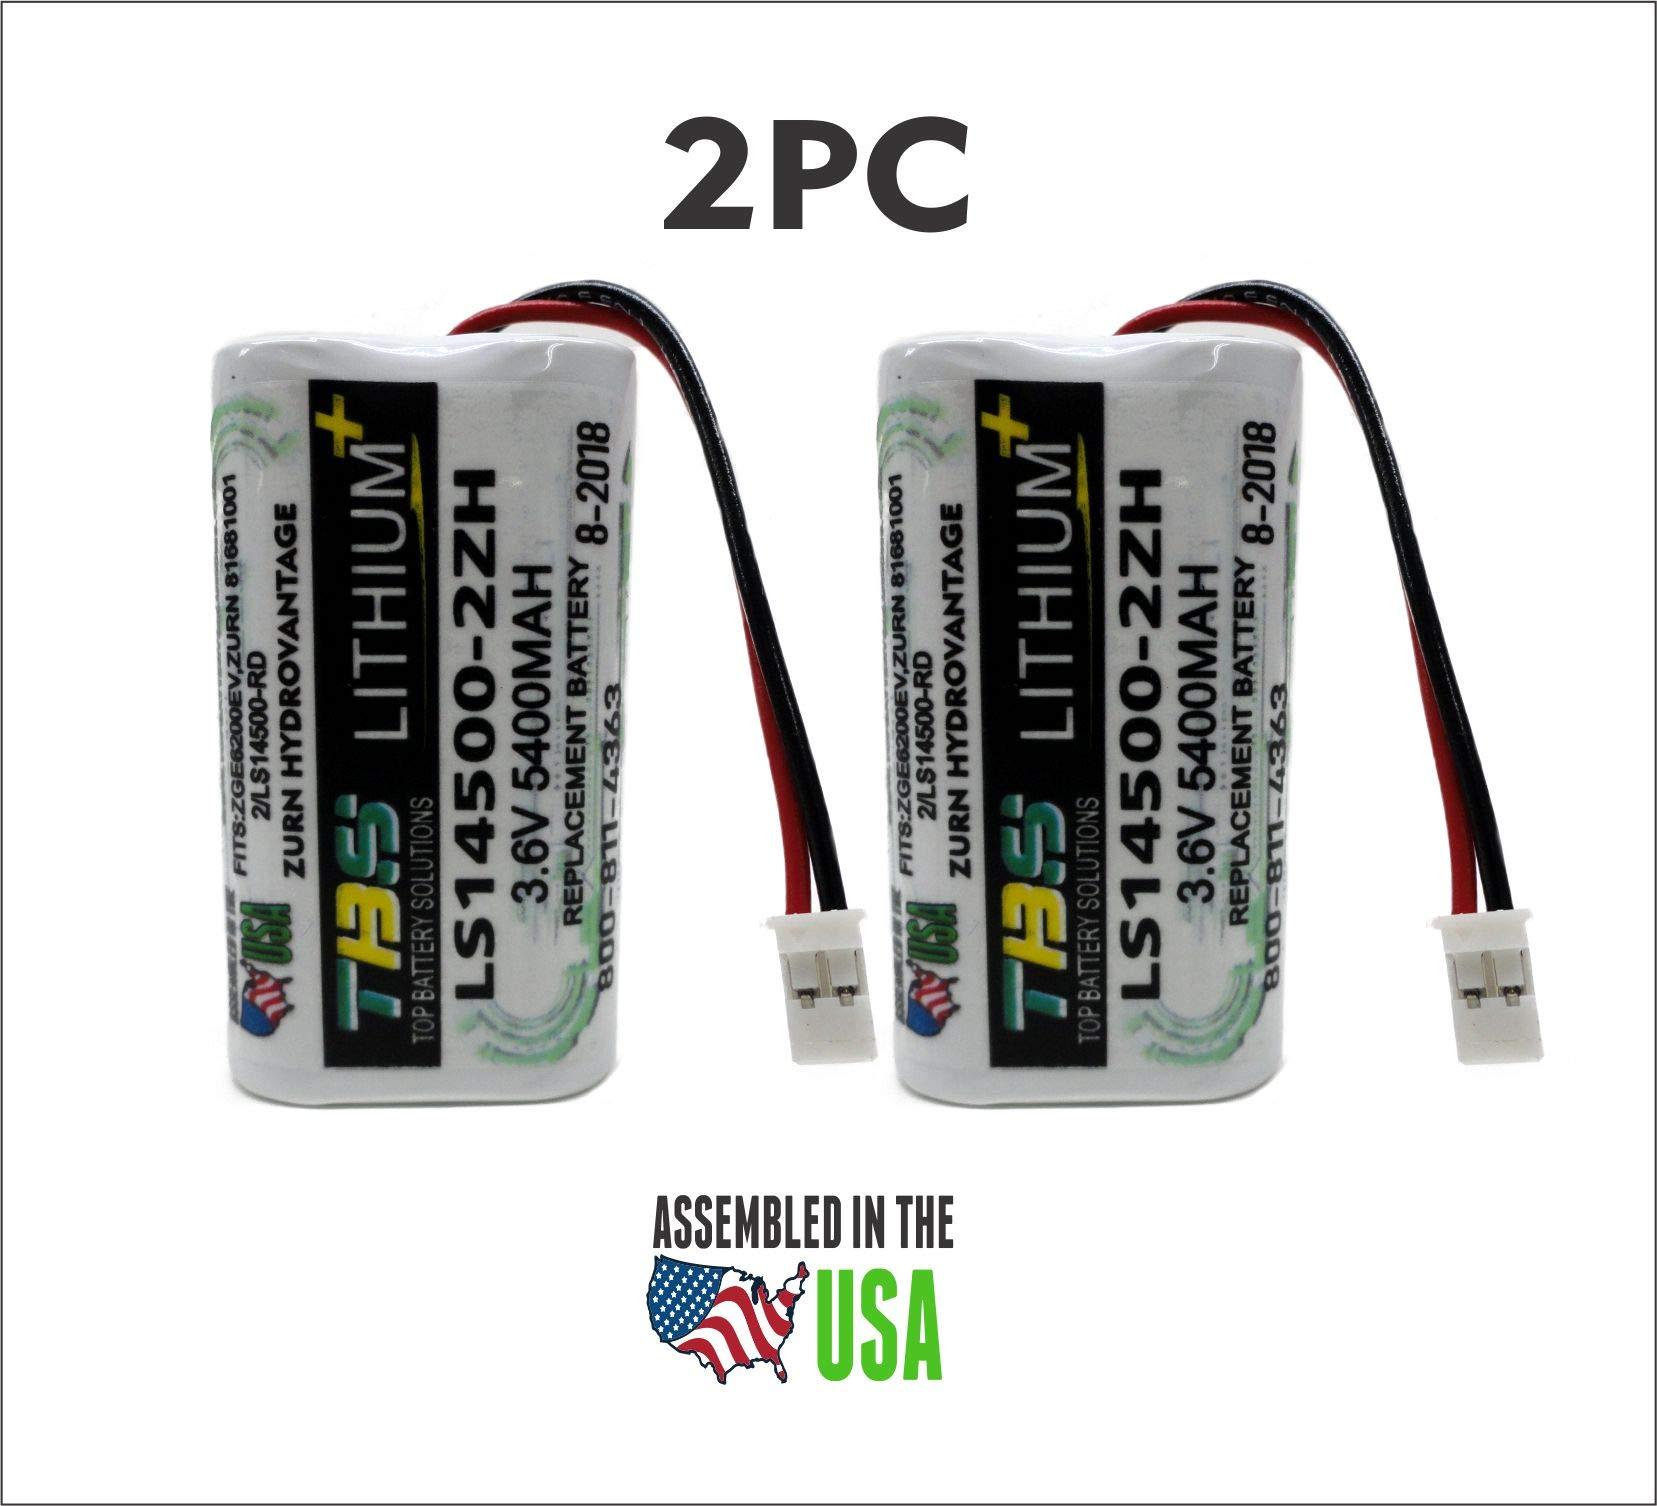 2PC Zurn HydroVantage ZGEN6200EV Battery - LS14500-2ZH / 81681001/2/LS14500-RD REPLACEMENT BATTERY